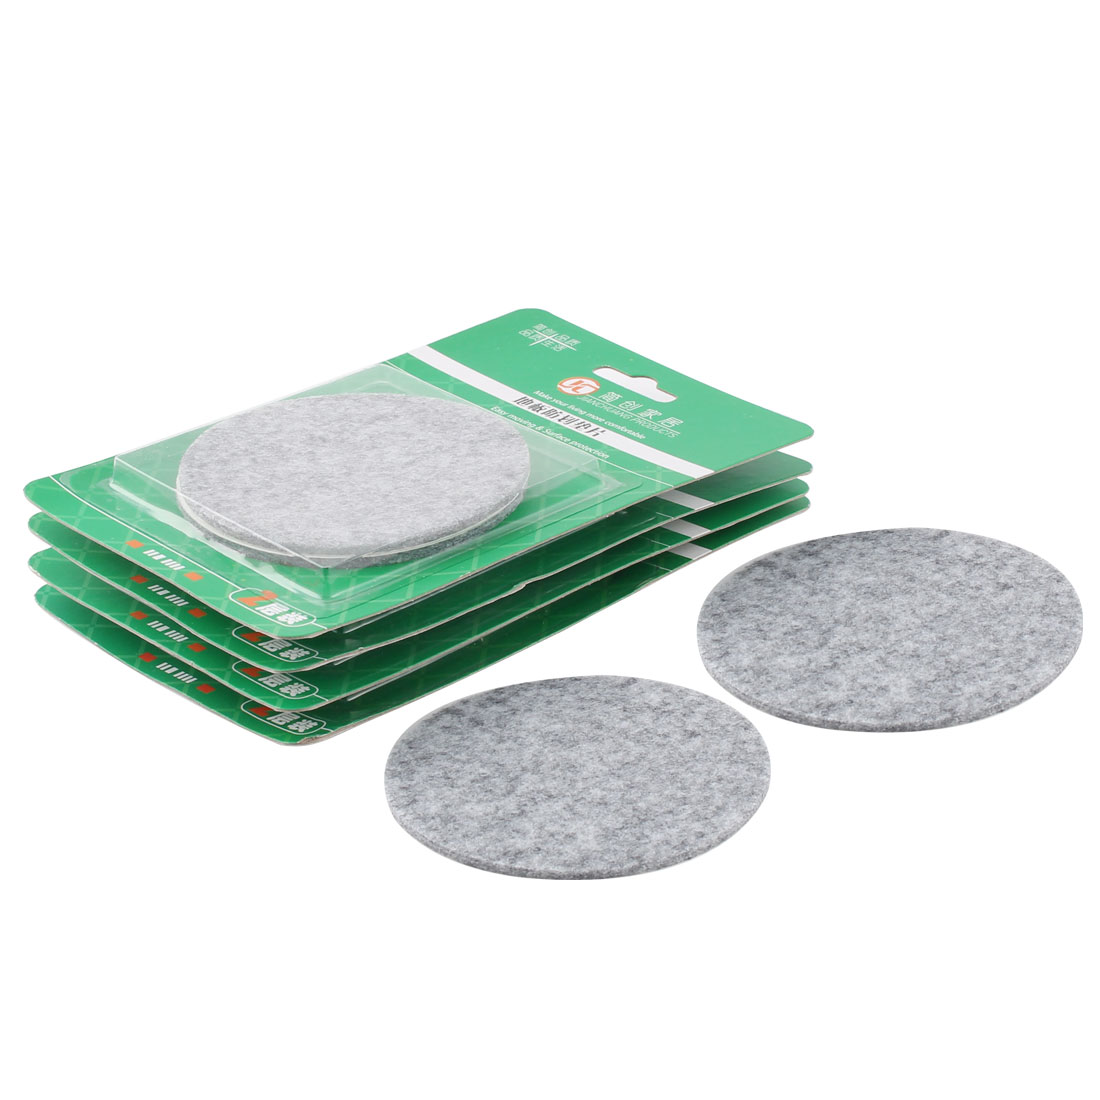 Felt pads for cabinet